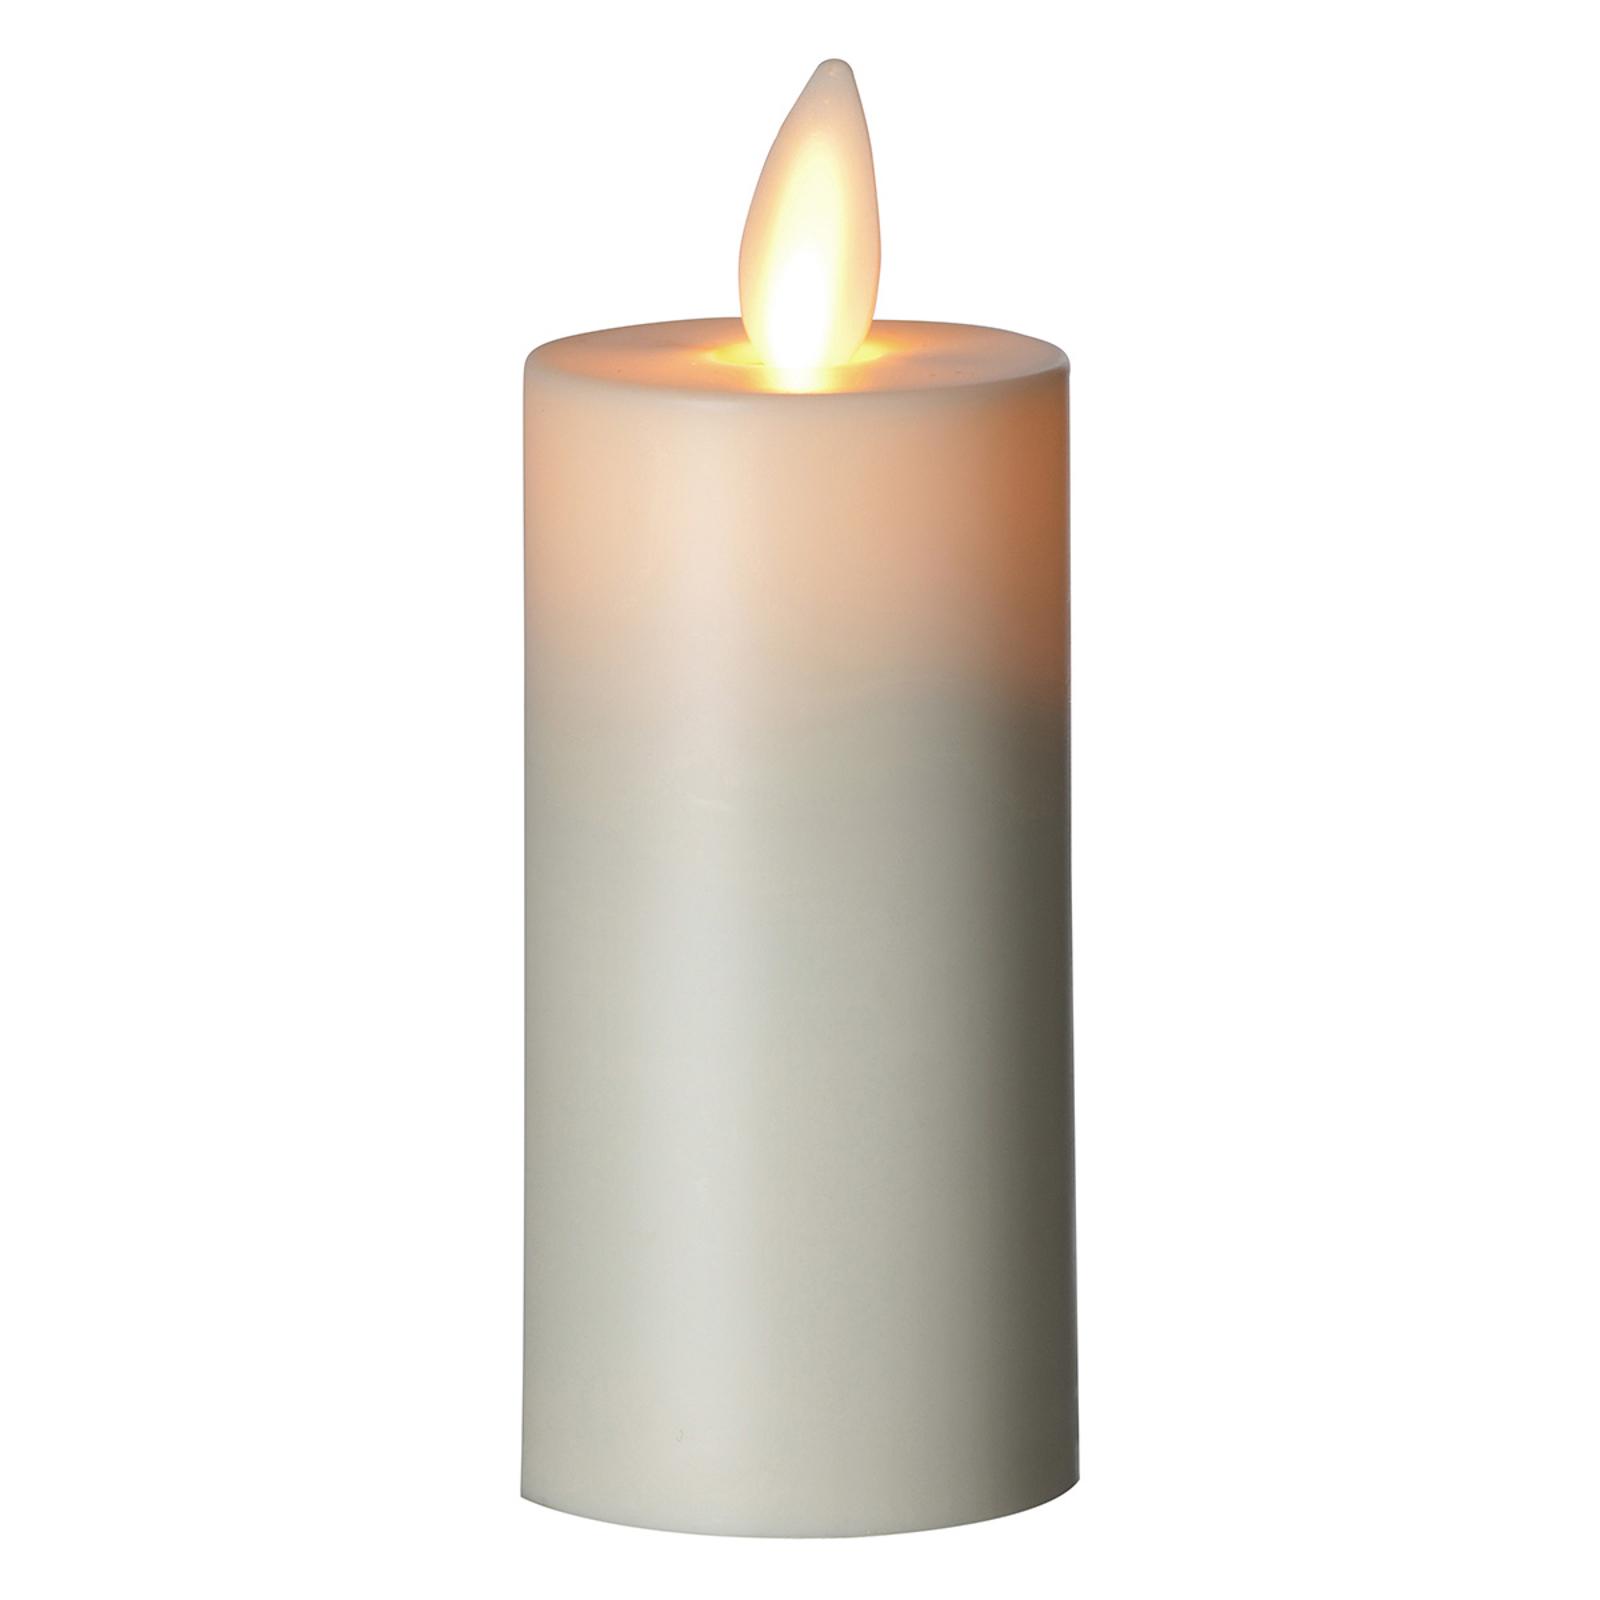 LED-stearinlys Flame telys XL, 8,3 cm